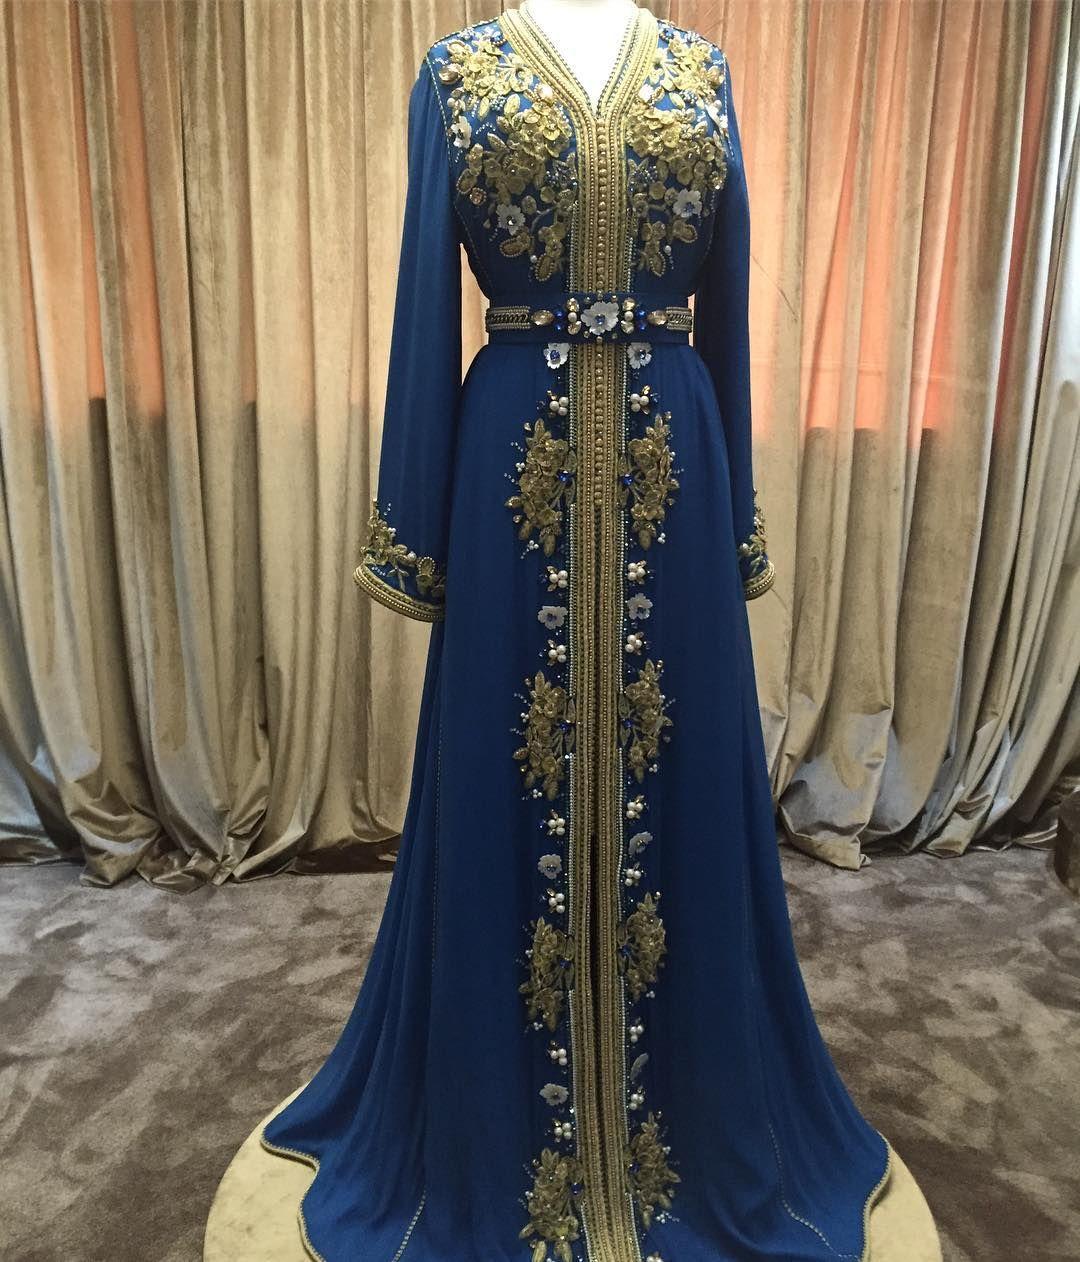 Nouvelle collection#perlage#tendance#mariée#swarovski#hautecouture#wedding#fashion @imane_guennoun